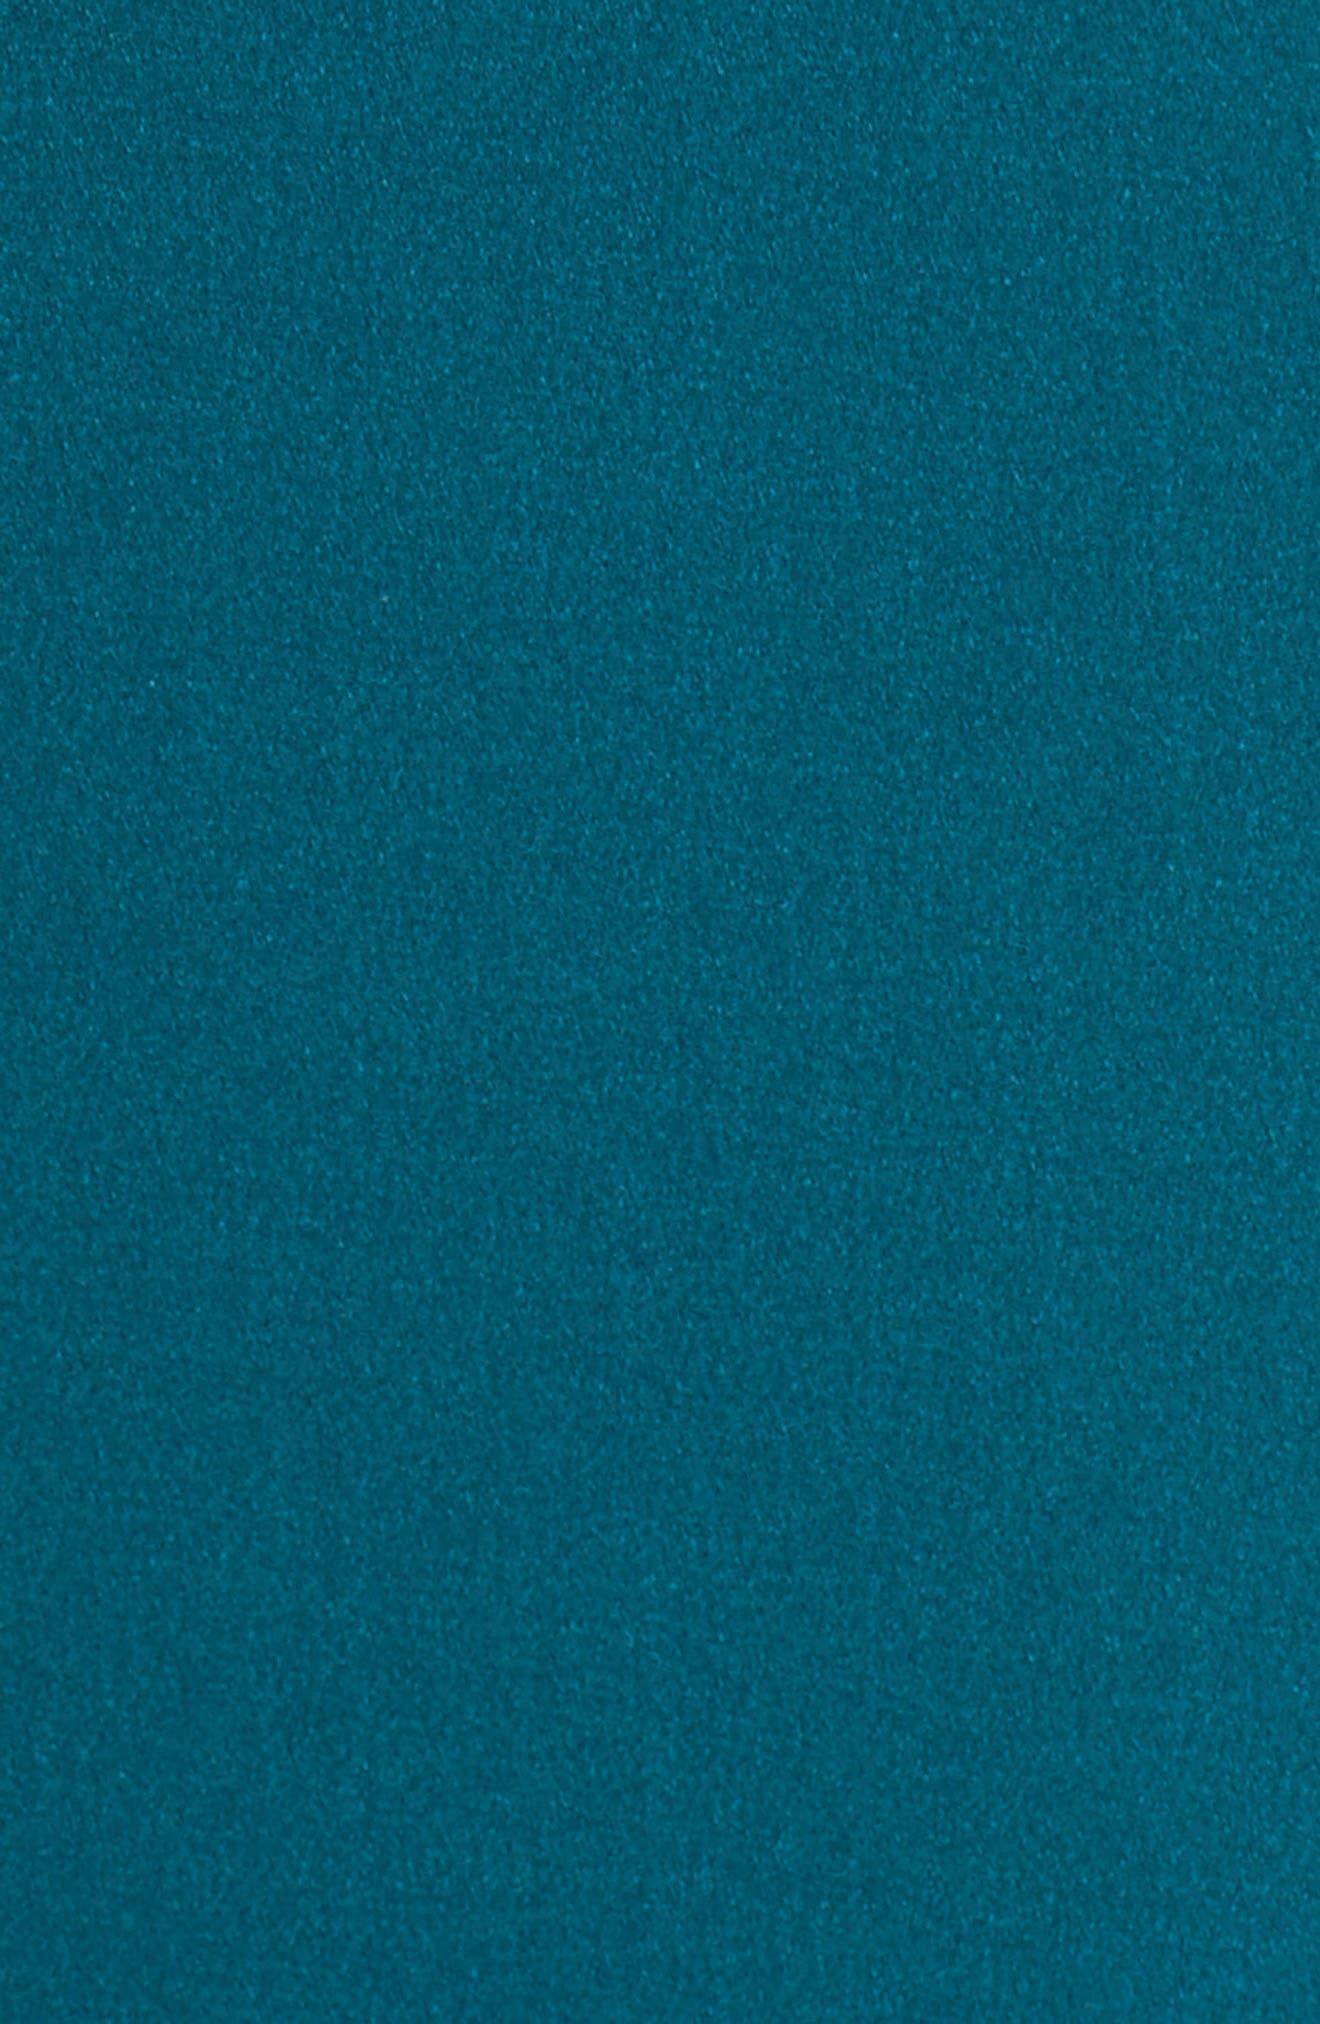 Ruffle Sheath Dress,                             Alternate thumbnail 6, color,                             Peacock